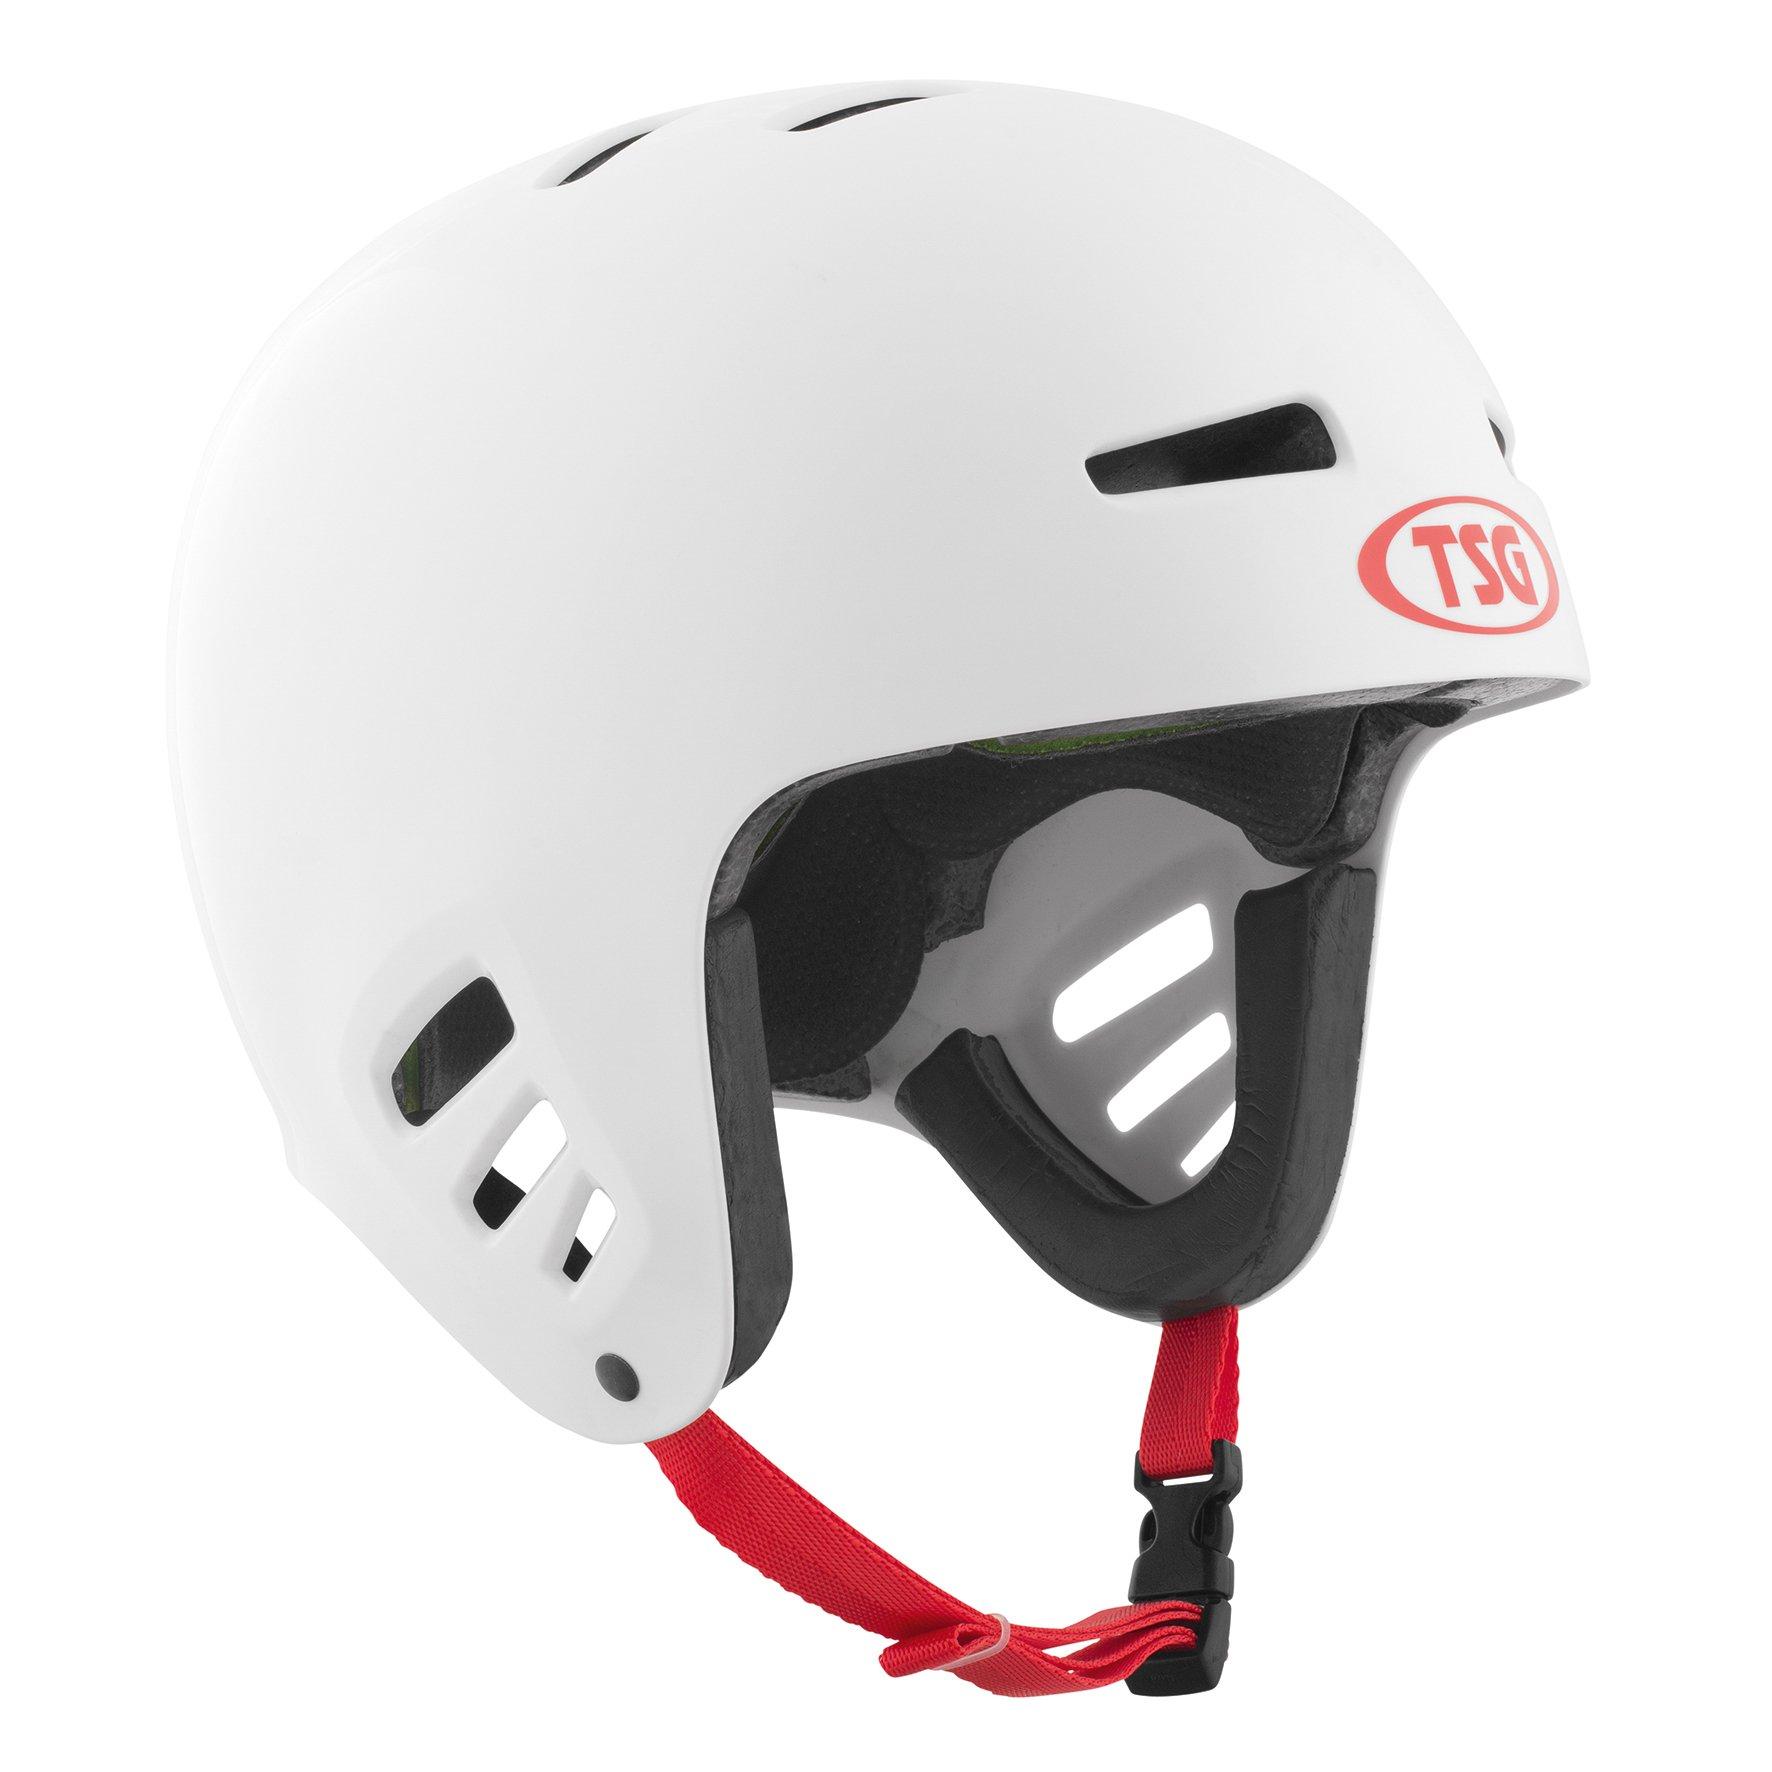 TSG - Dawn Flex Solid Color (White, L/XL 57-59 cm) Helmet for Bicycle Skateboard